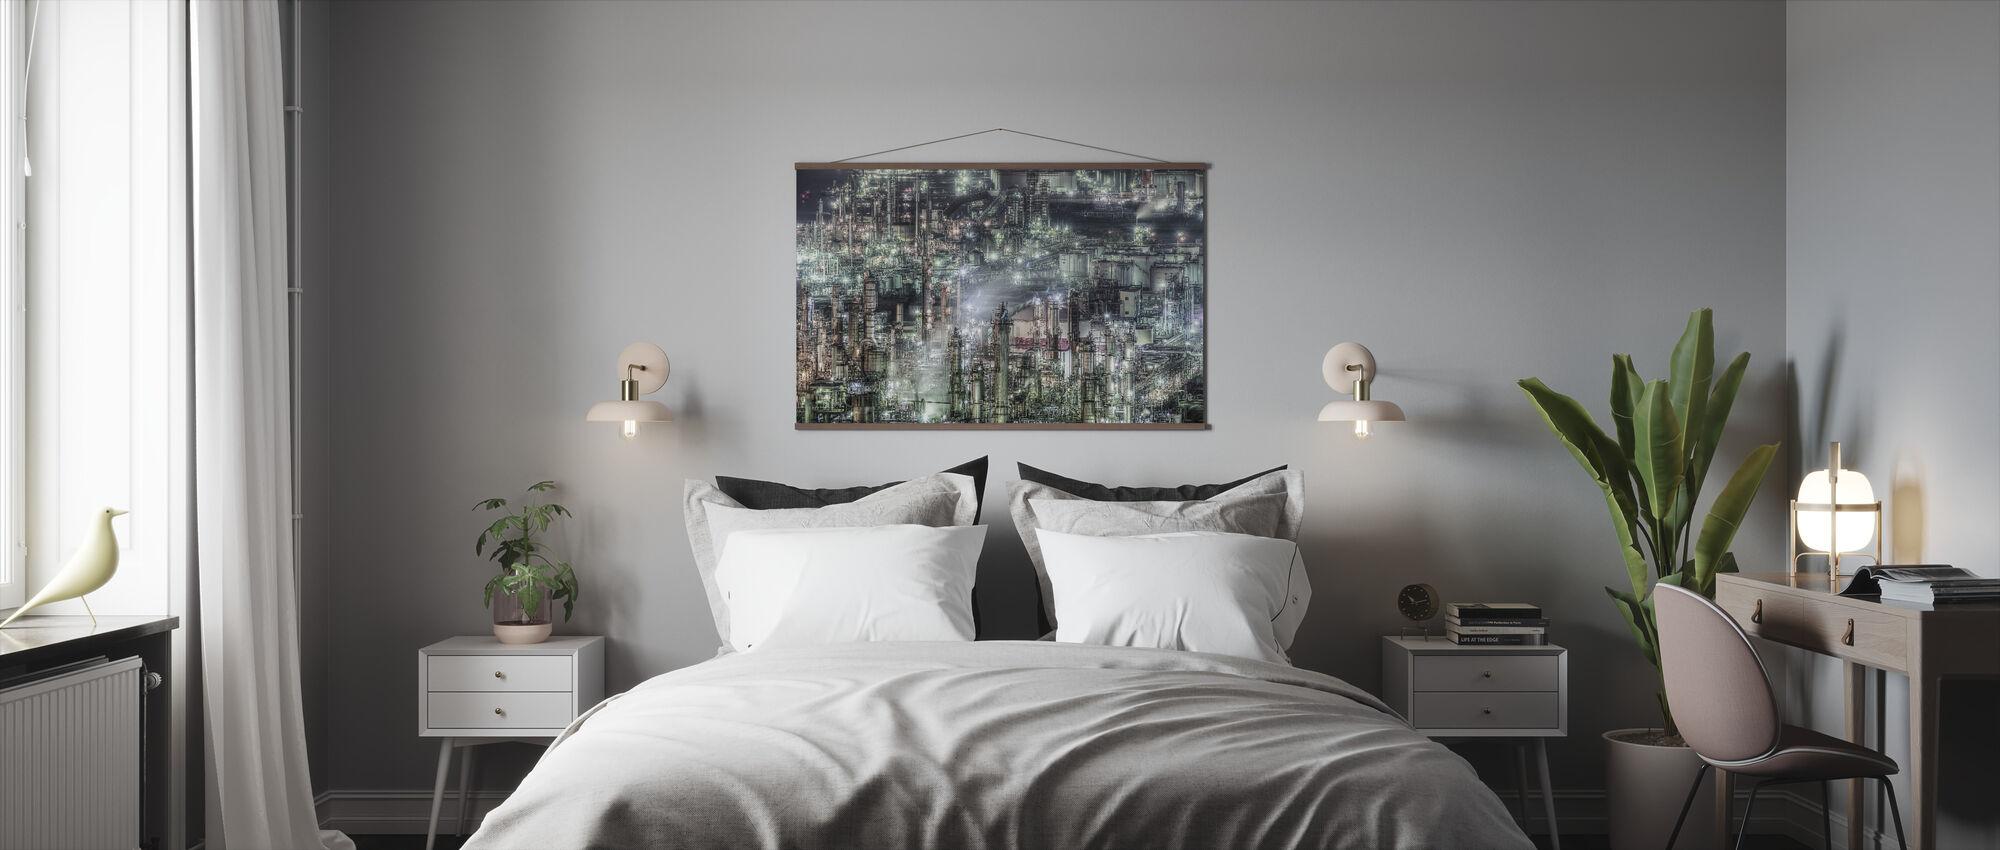 Jungle - Poster - Bedroom